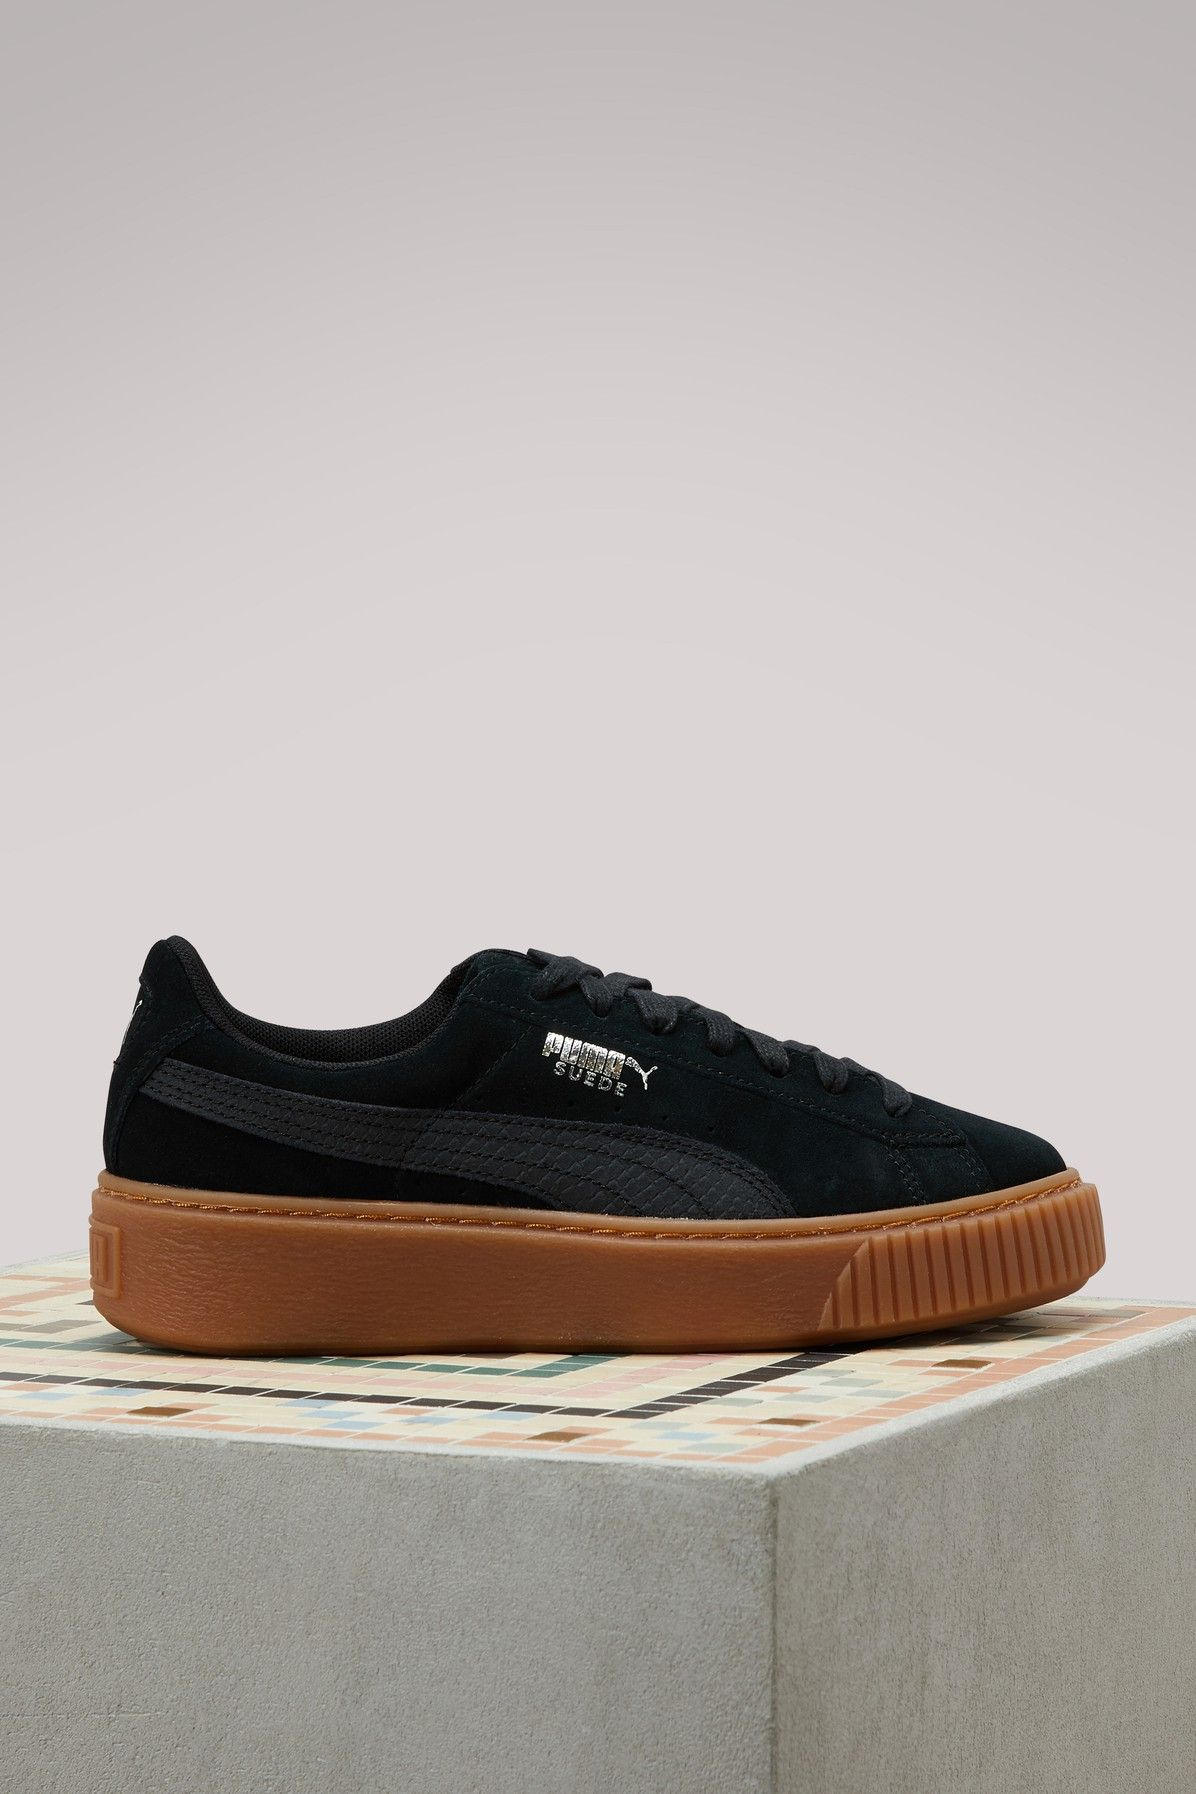 low cost 52aa8 0a239 PUMA SUEDE PLATFORM GUM SNEAKERS. #puma #shoes # | Puma